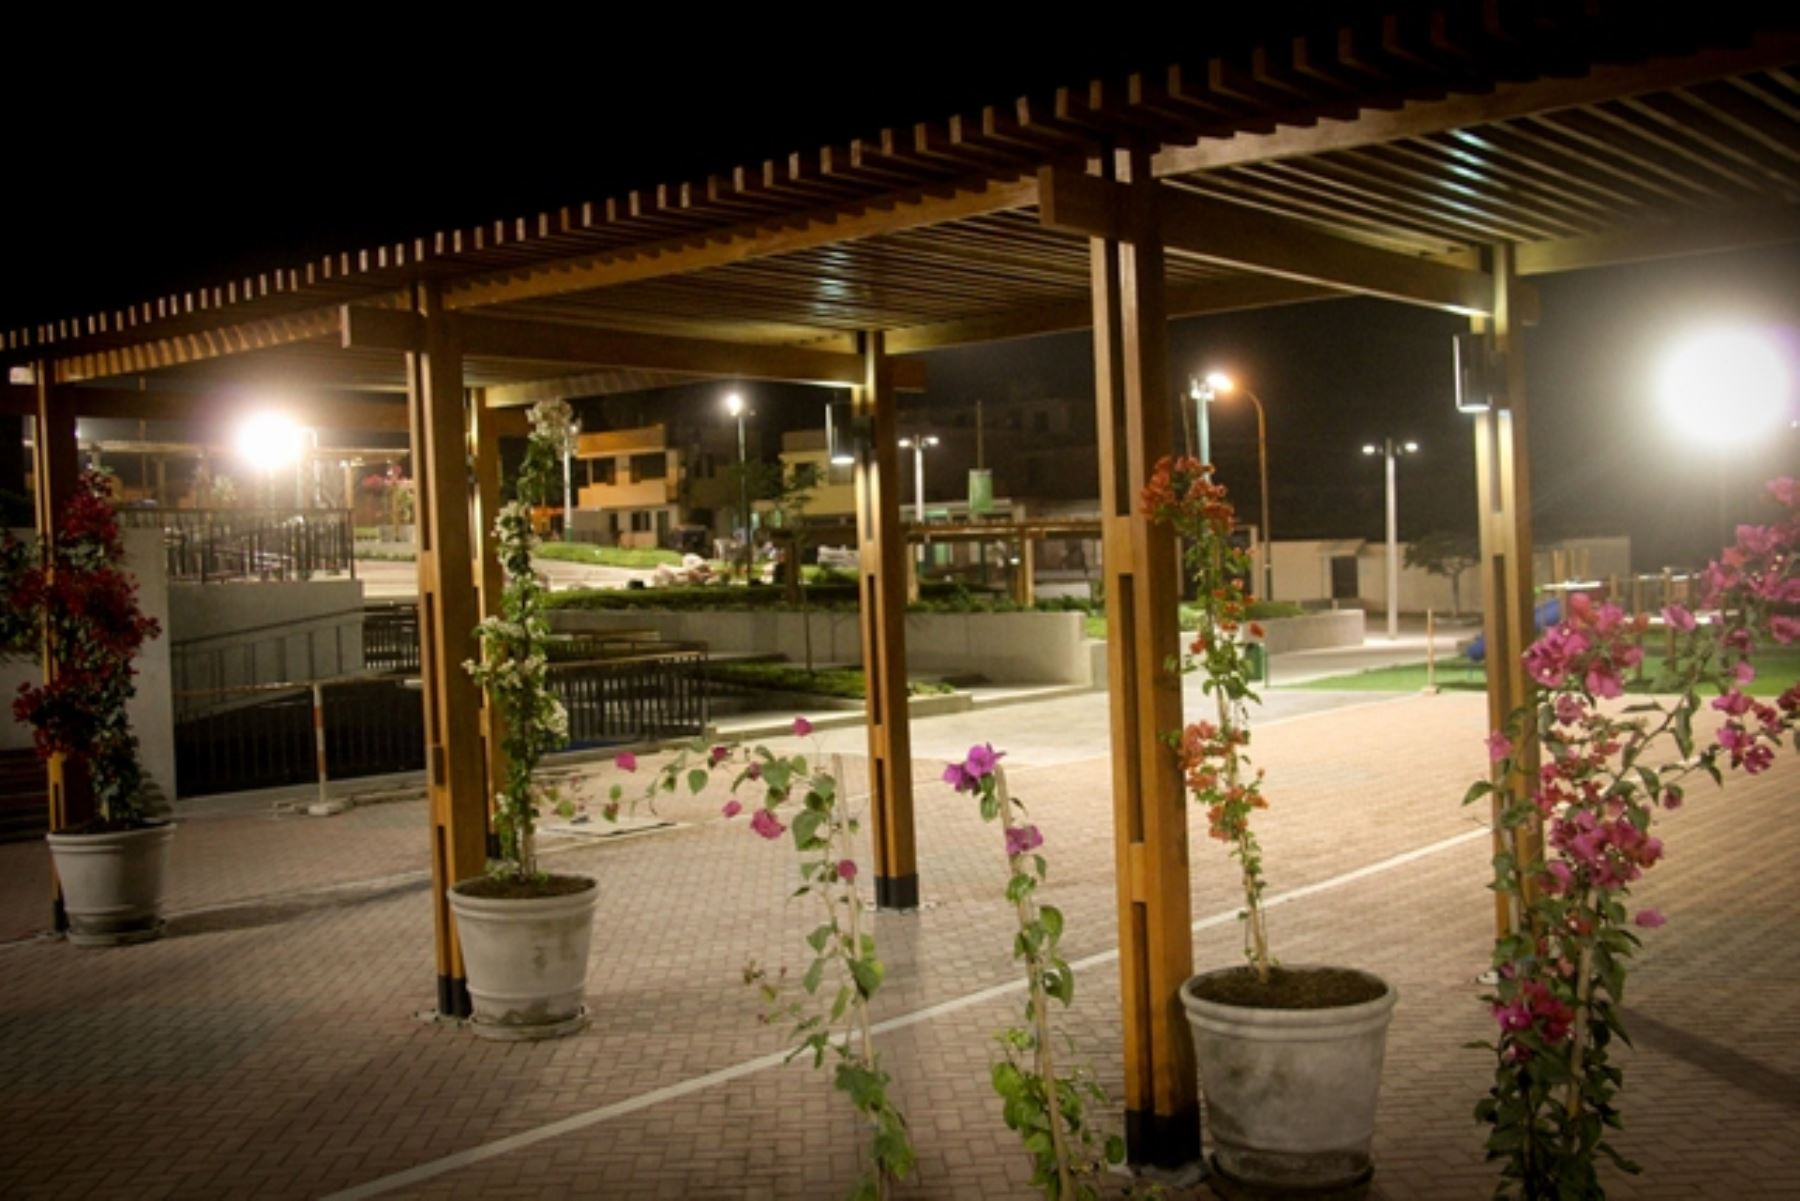 Moderna plaza de armas de Cieneguilla. Foto: Difusión